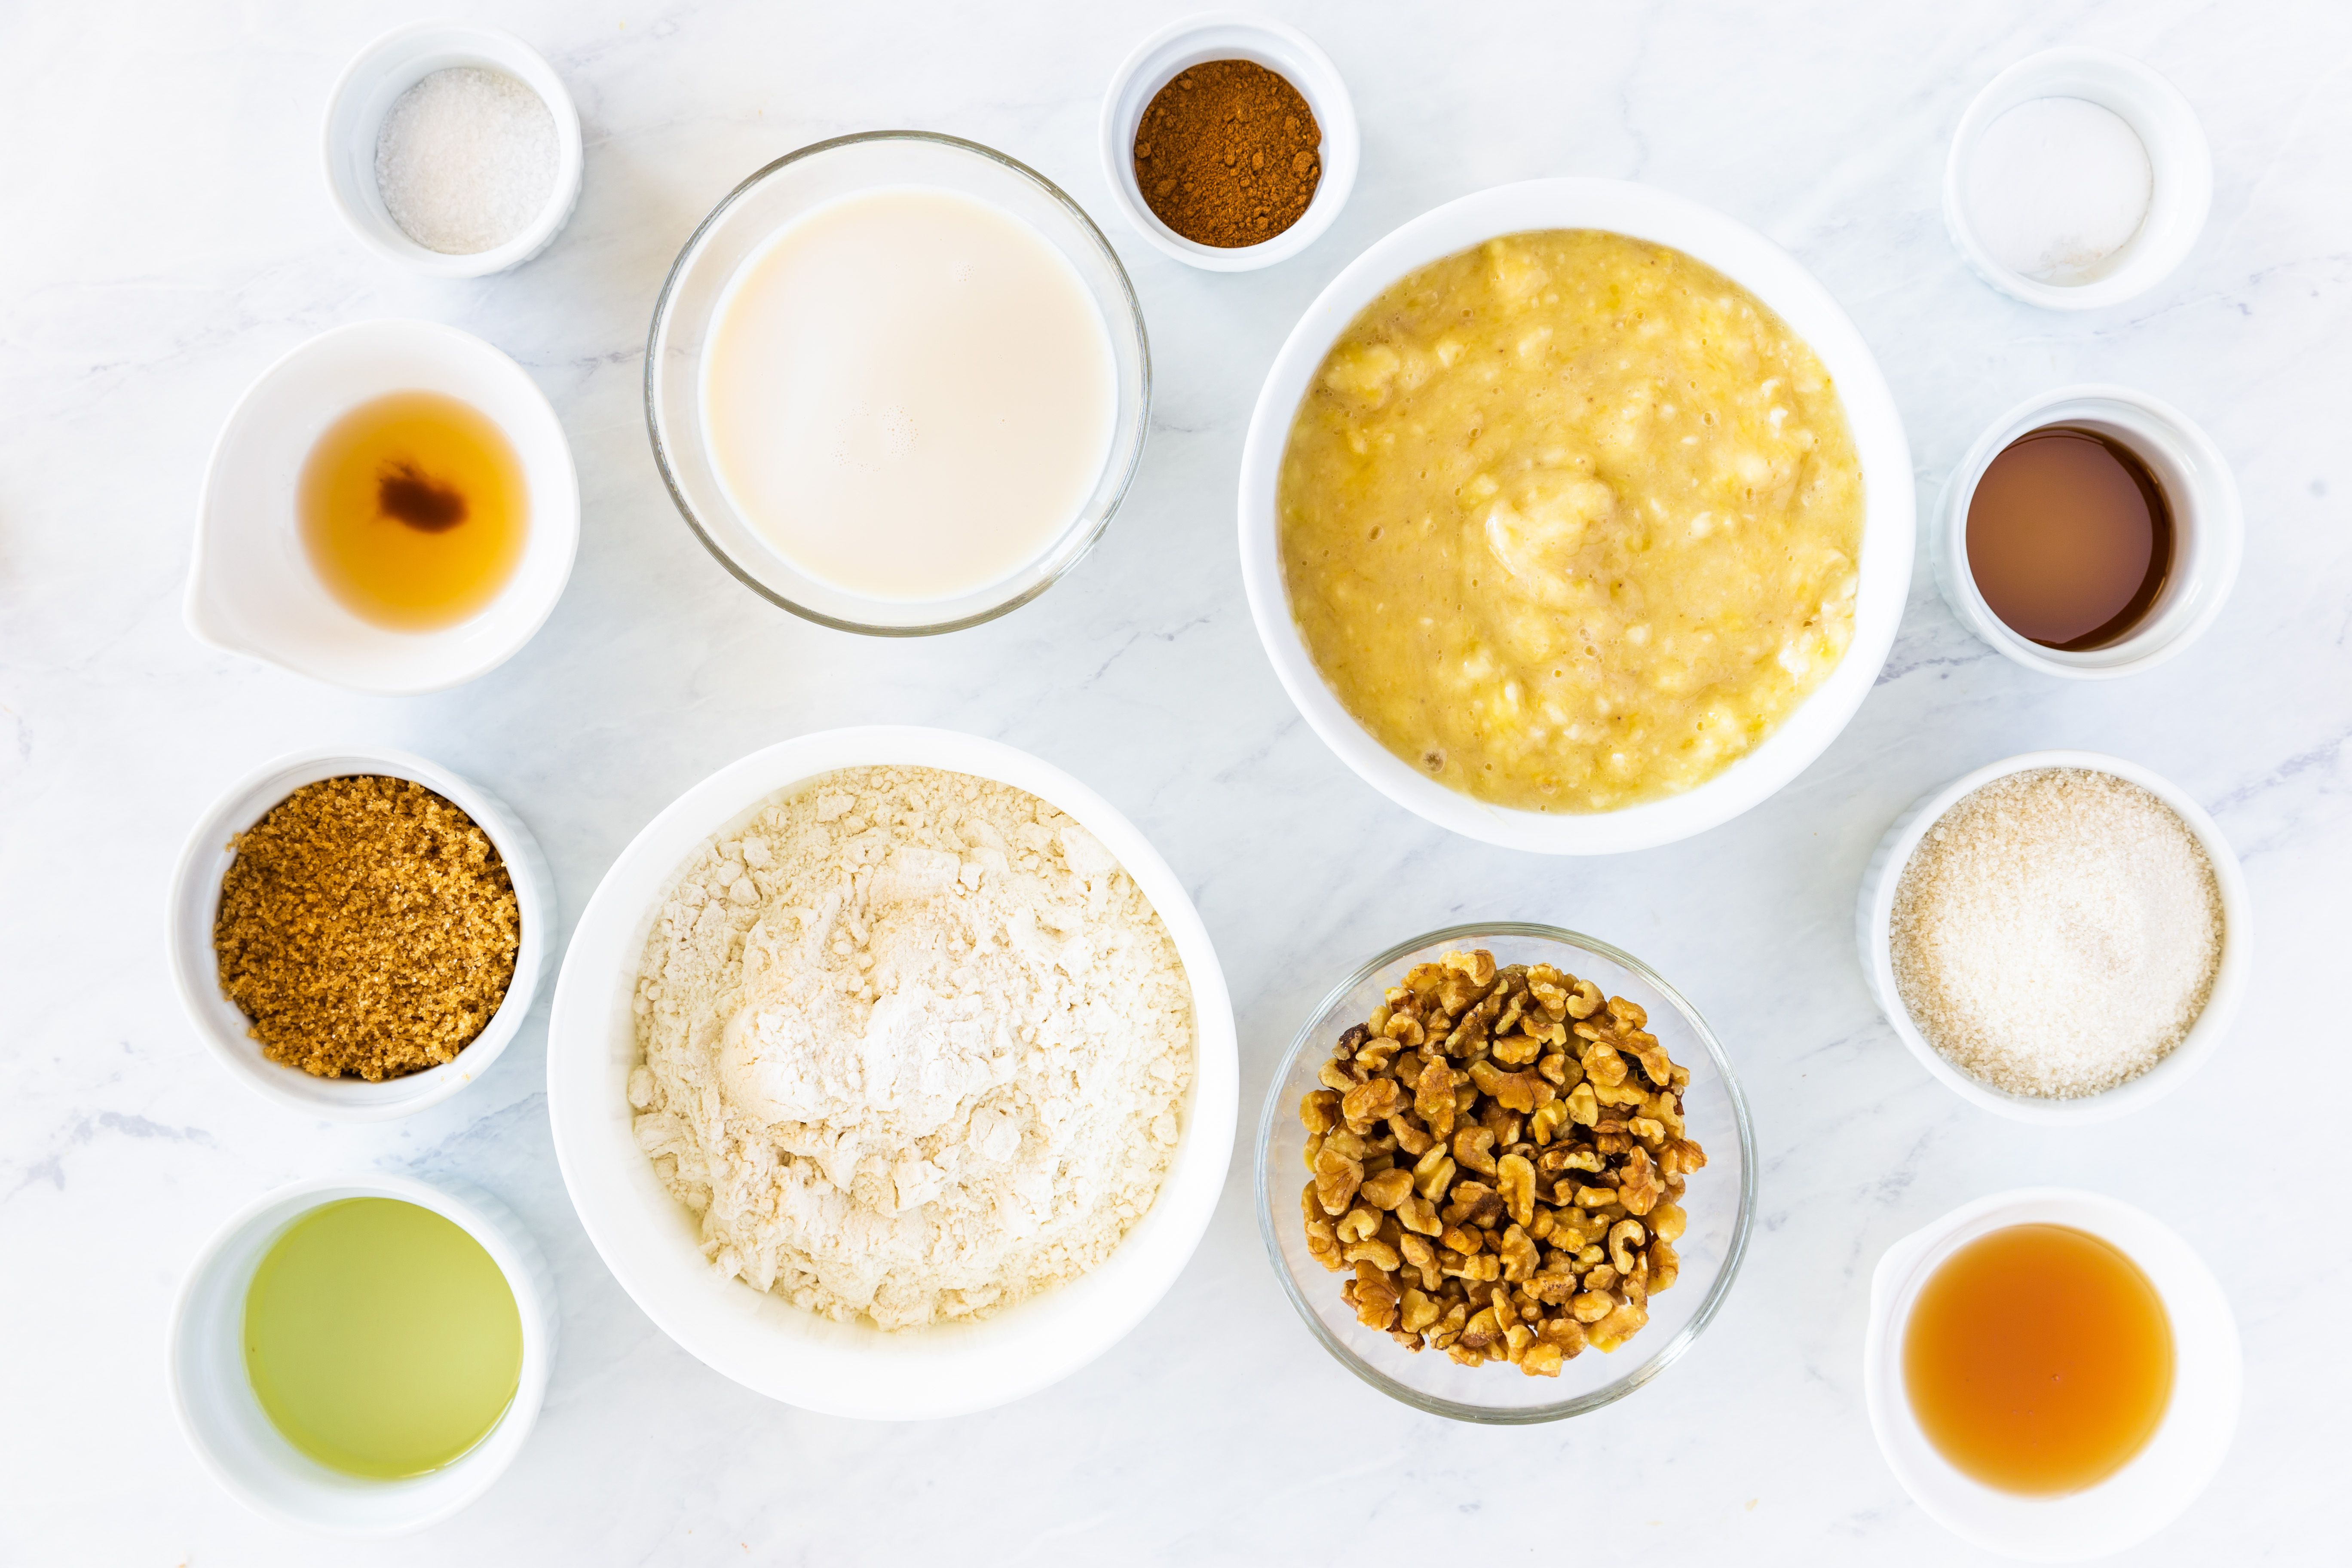 Ingredients for vegan banana bread